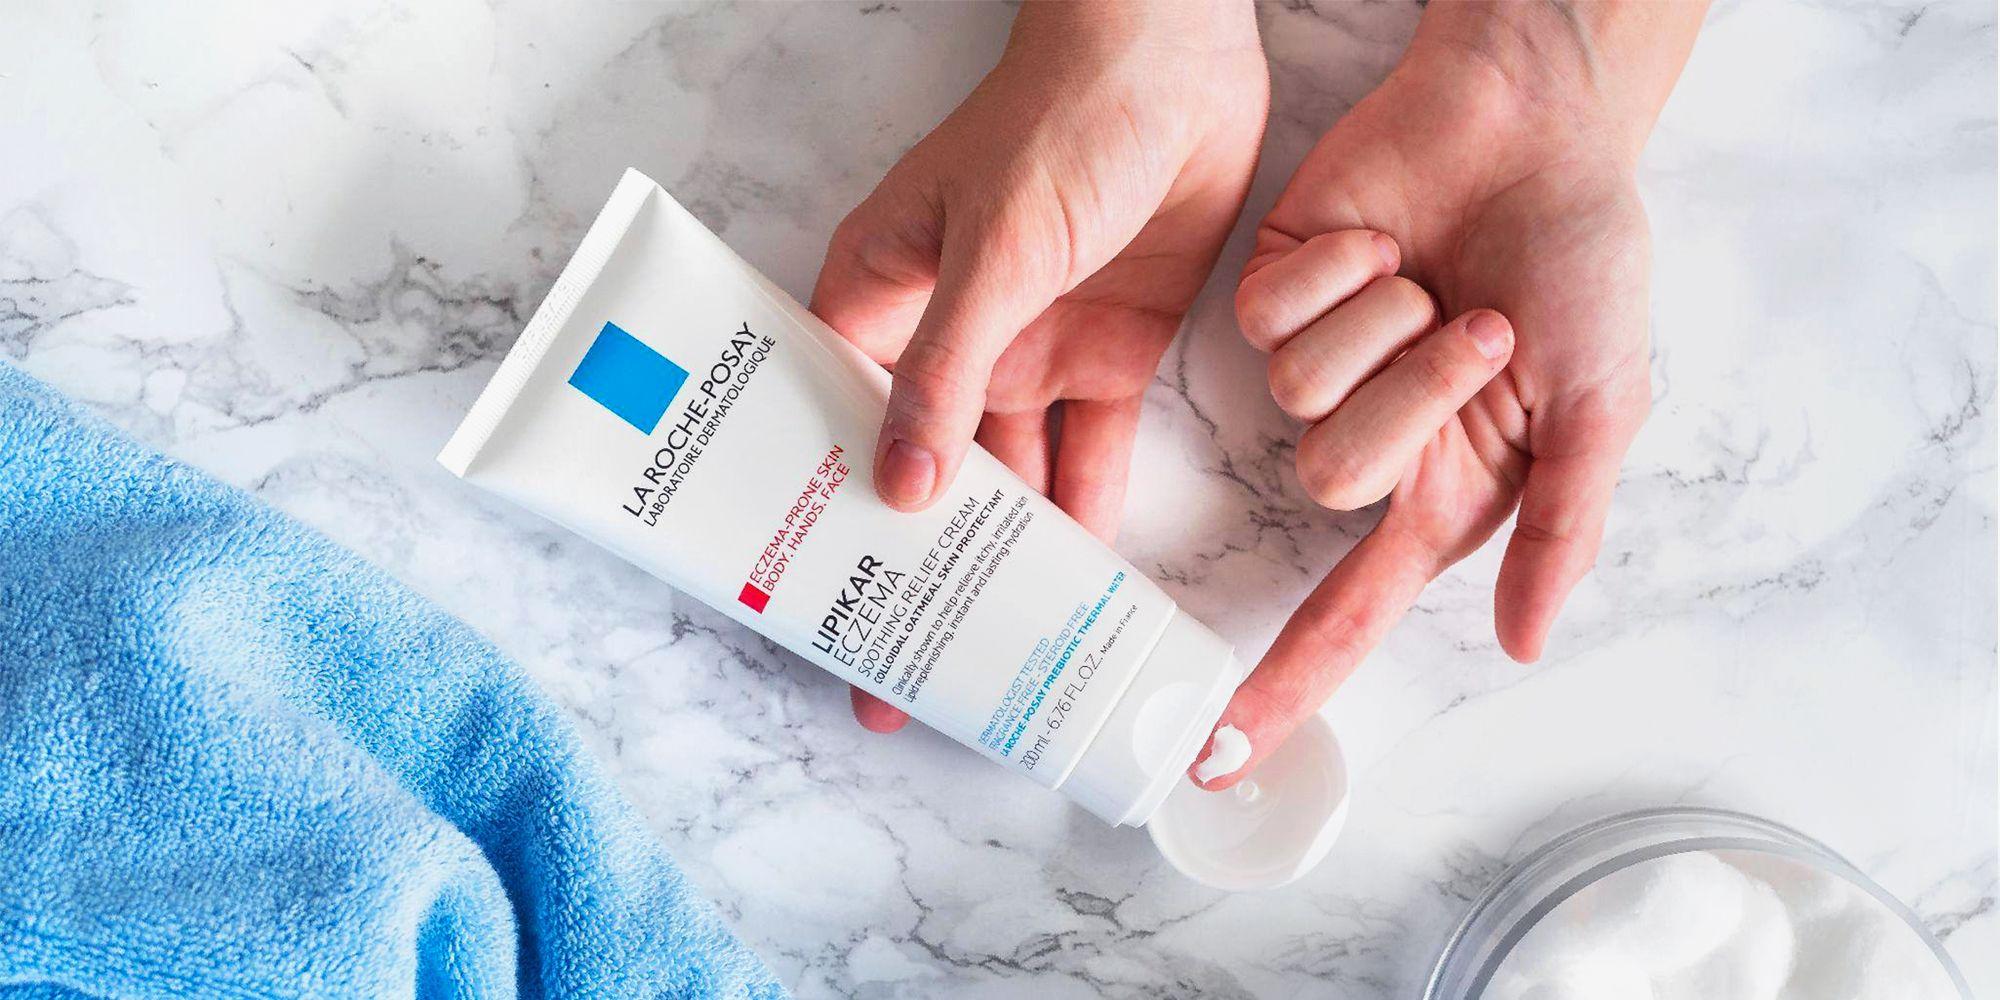 9 Best Eczema Creams for Skin Relief - Best Lotions to Treat Eczema